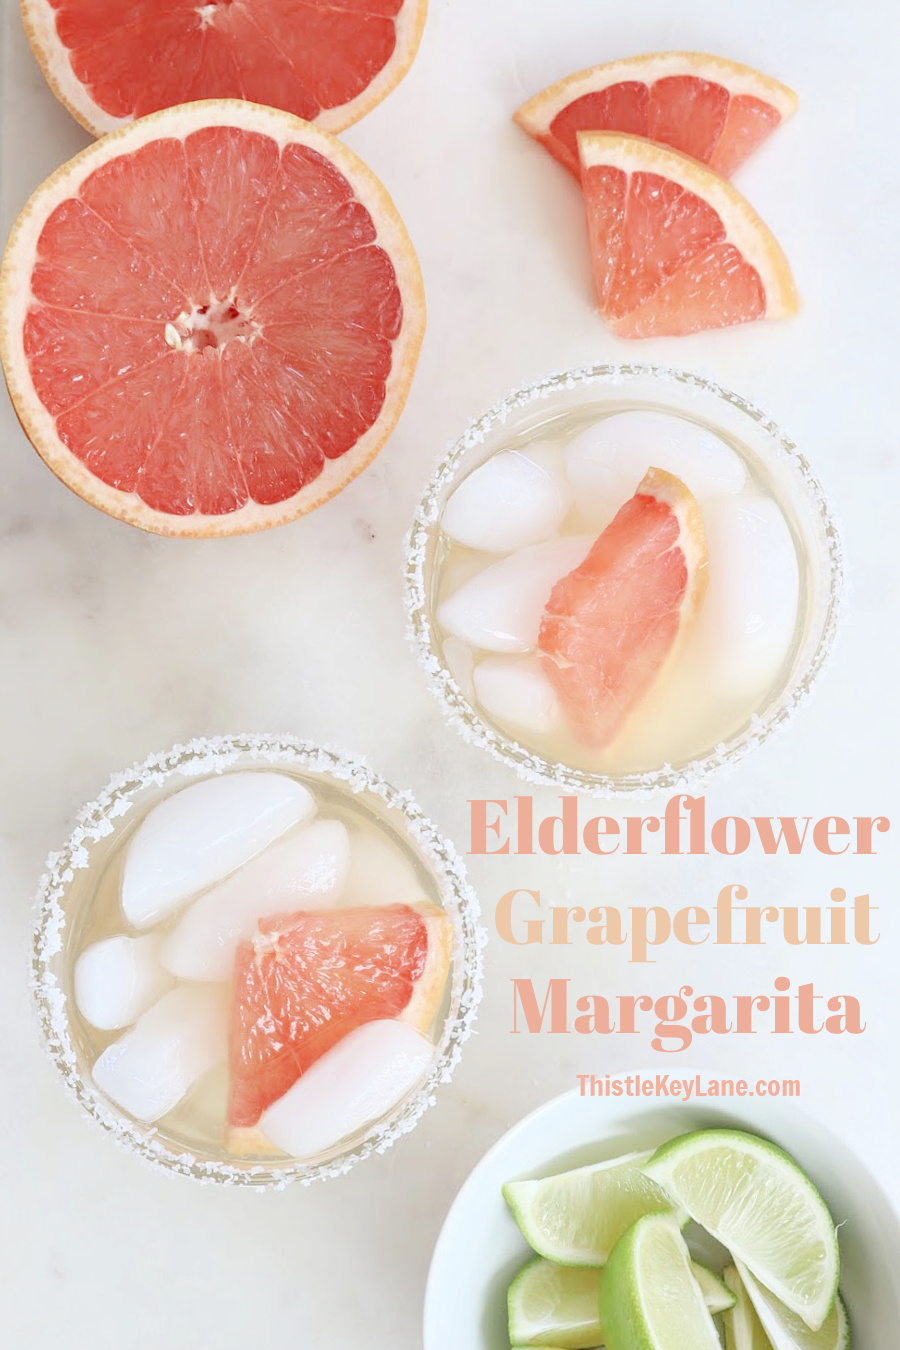 Elderflower Grapefruit Margarita Cocktail Recipe